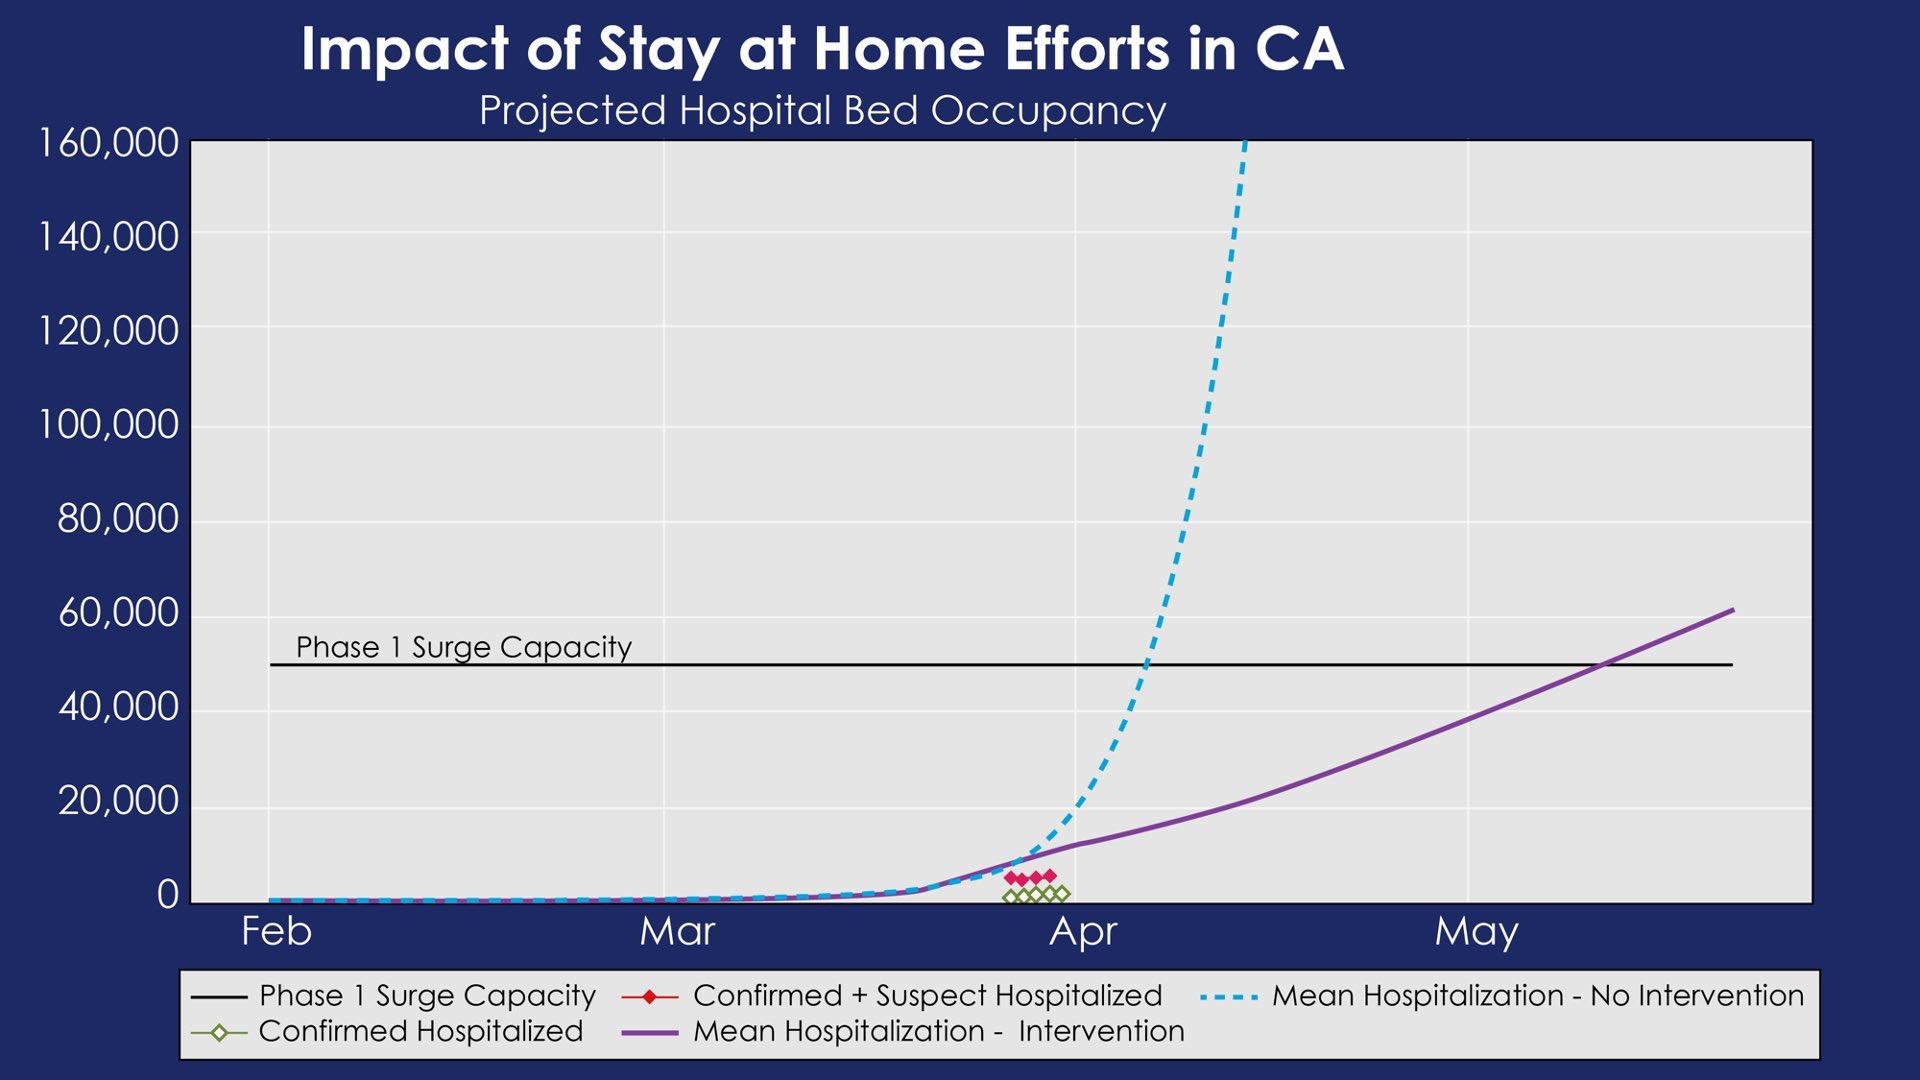 COVID-19 Projected Impact Curve, https://twitter.com/GavinNewsom/status/1245492078013906944